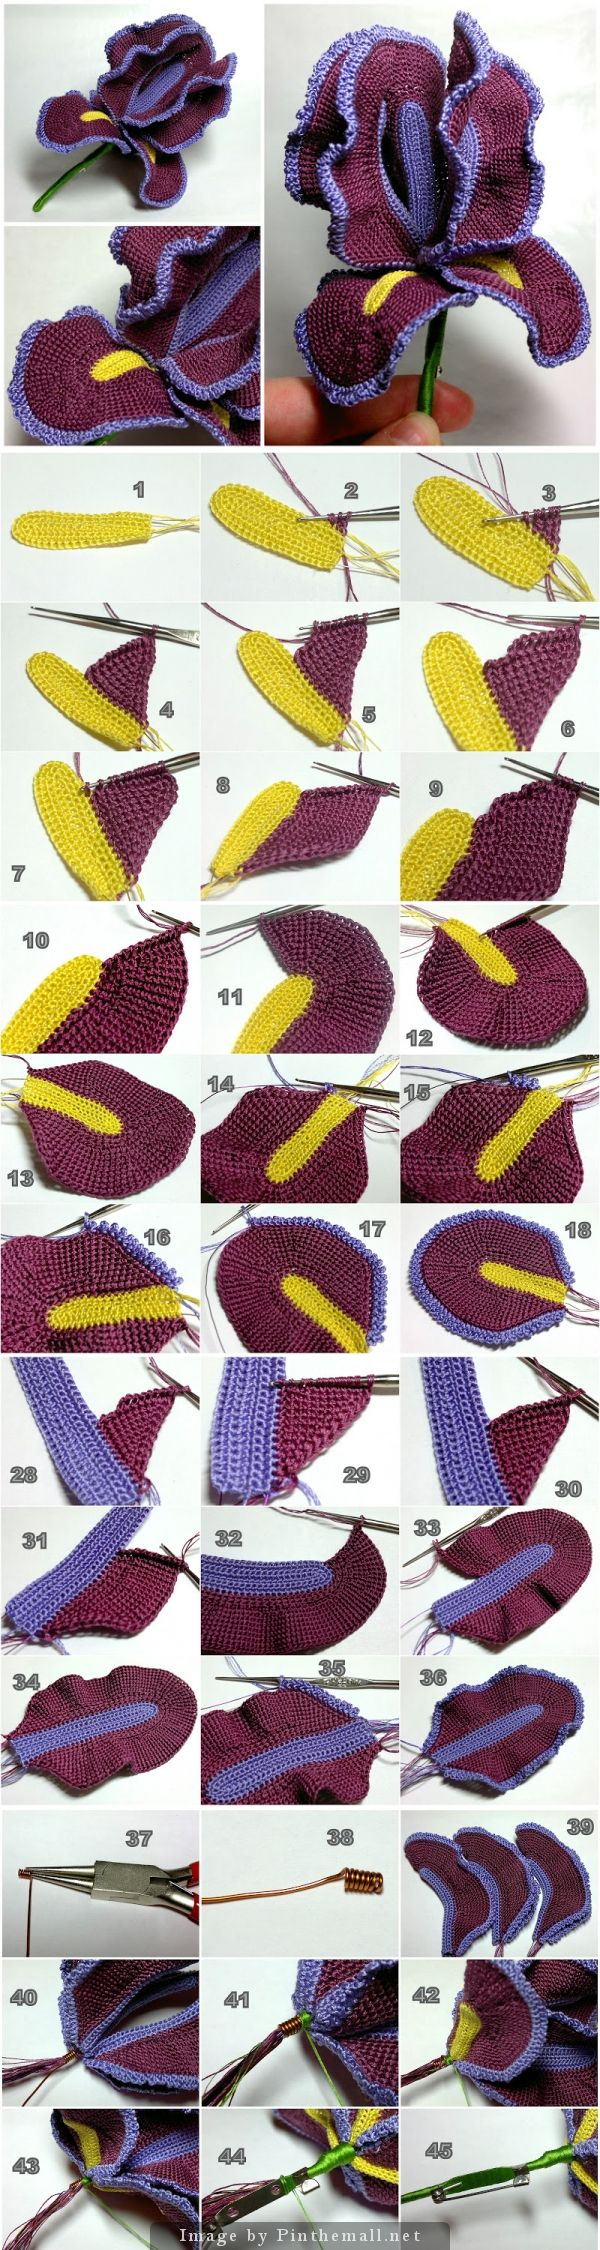 how to get deathglare iris